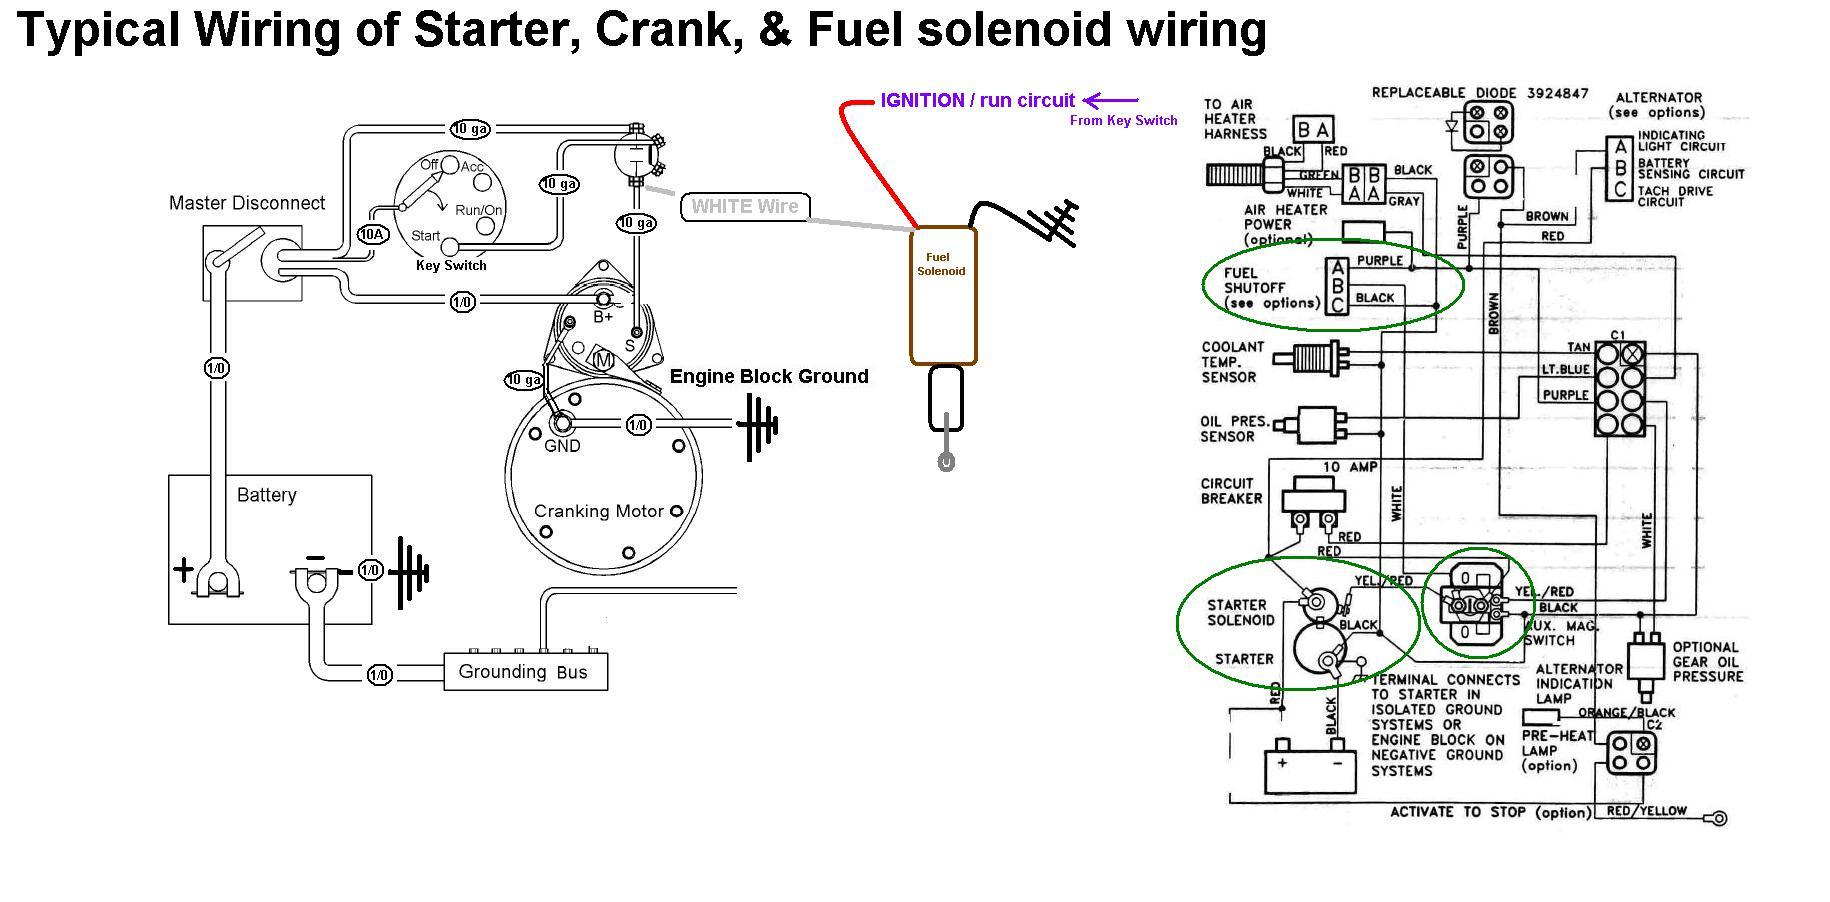 8 3 Cummins Fuel Shutoff Solenoid Wiring Diagram